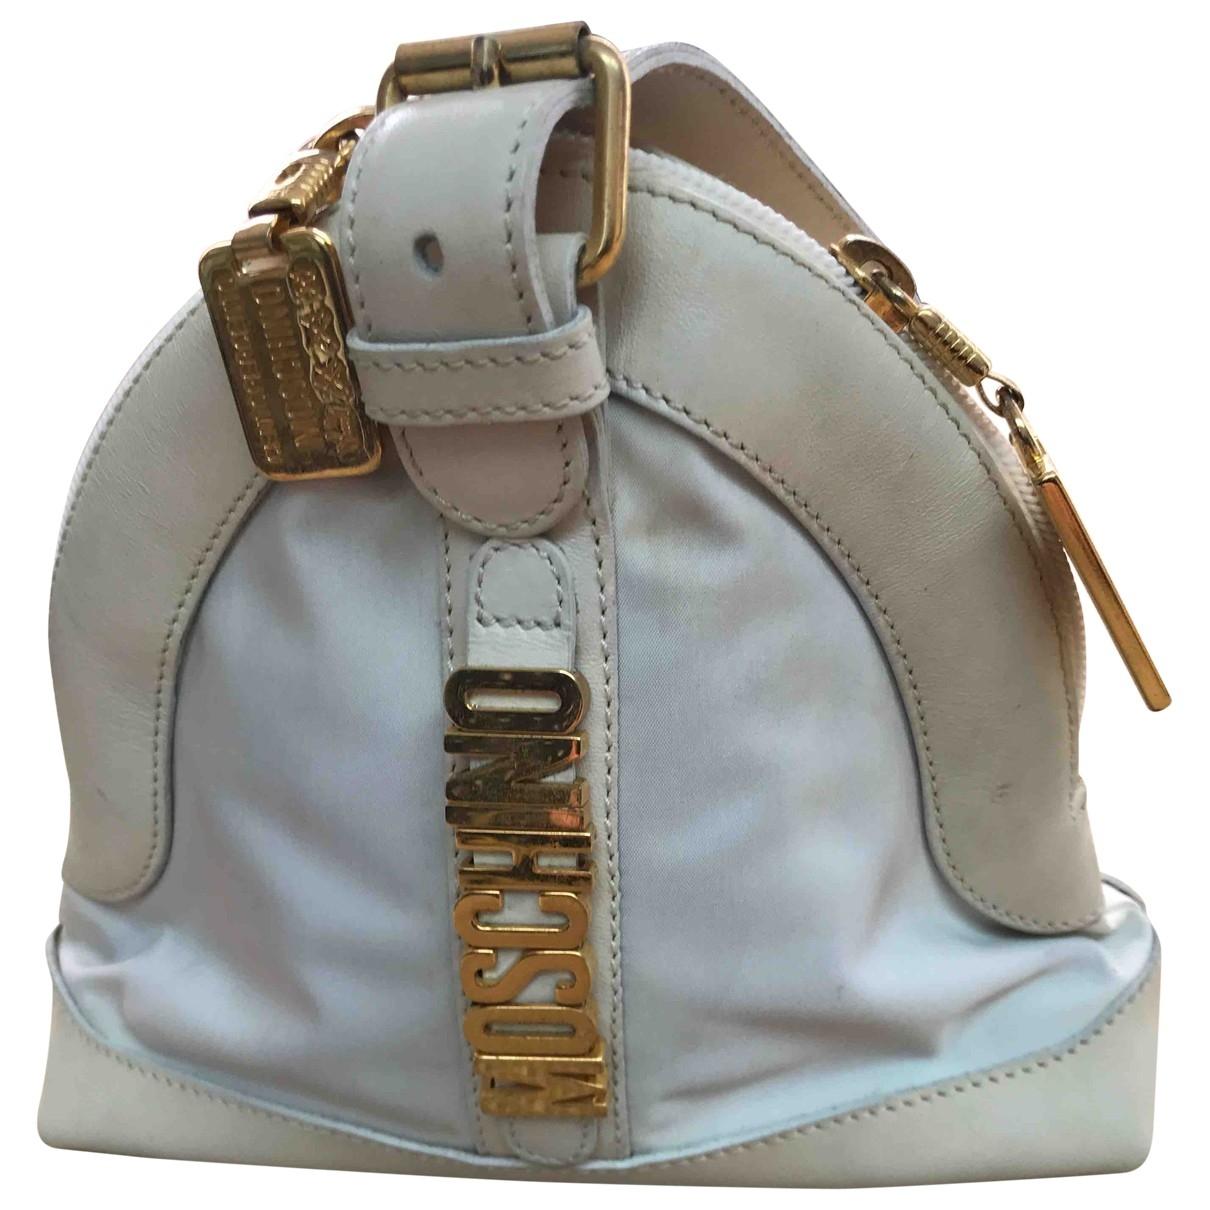 Moschino \N Beige Leather handbag for Women \N